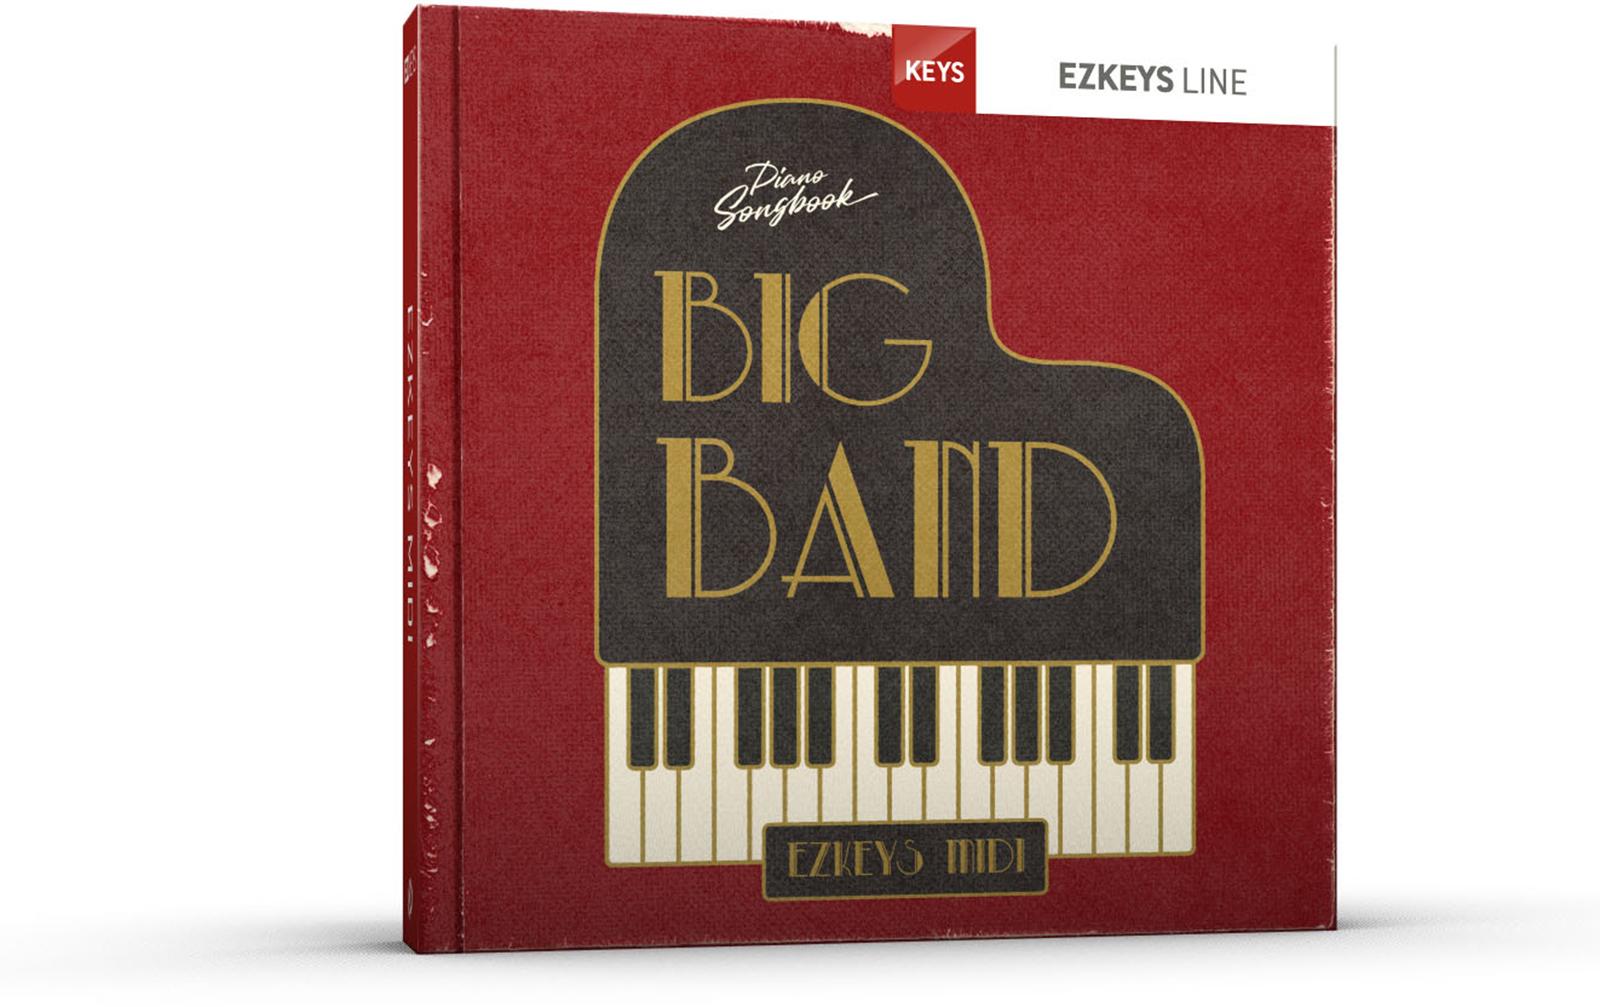 toontrack-ezkeys-big-band-midi-pack-download-